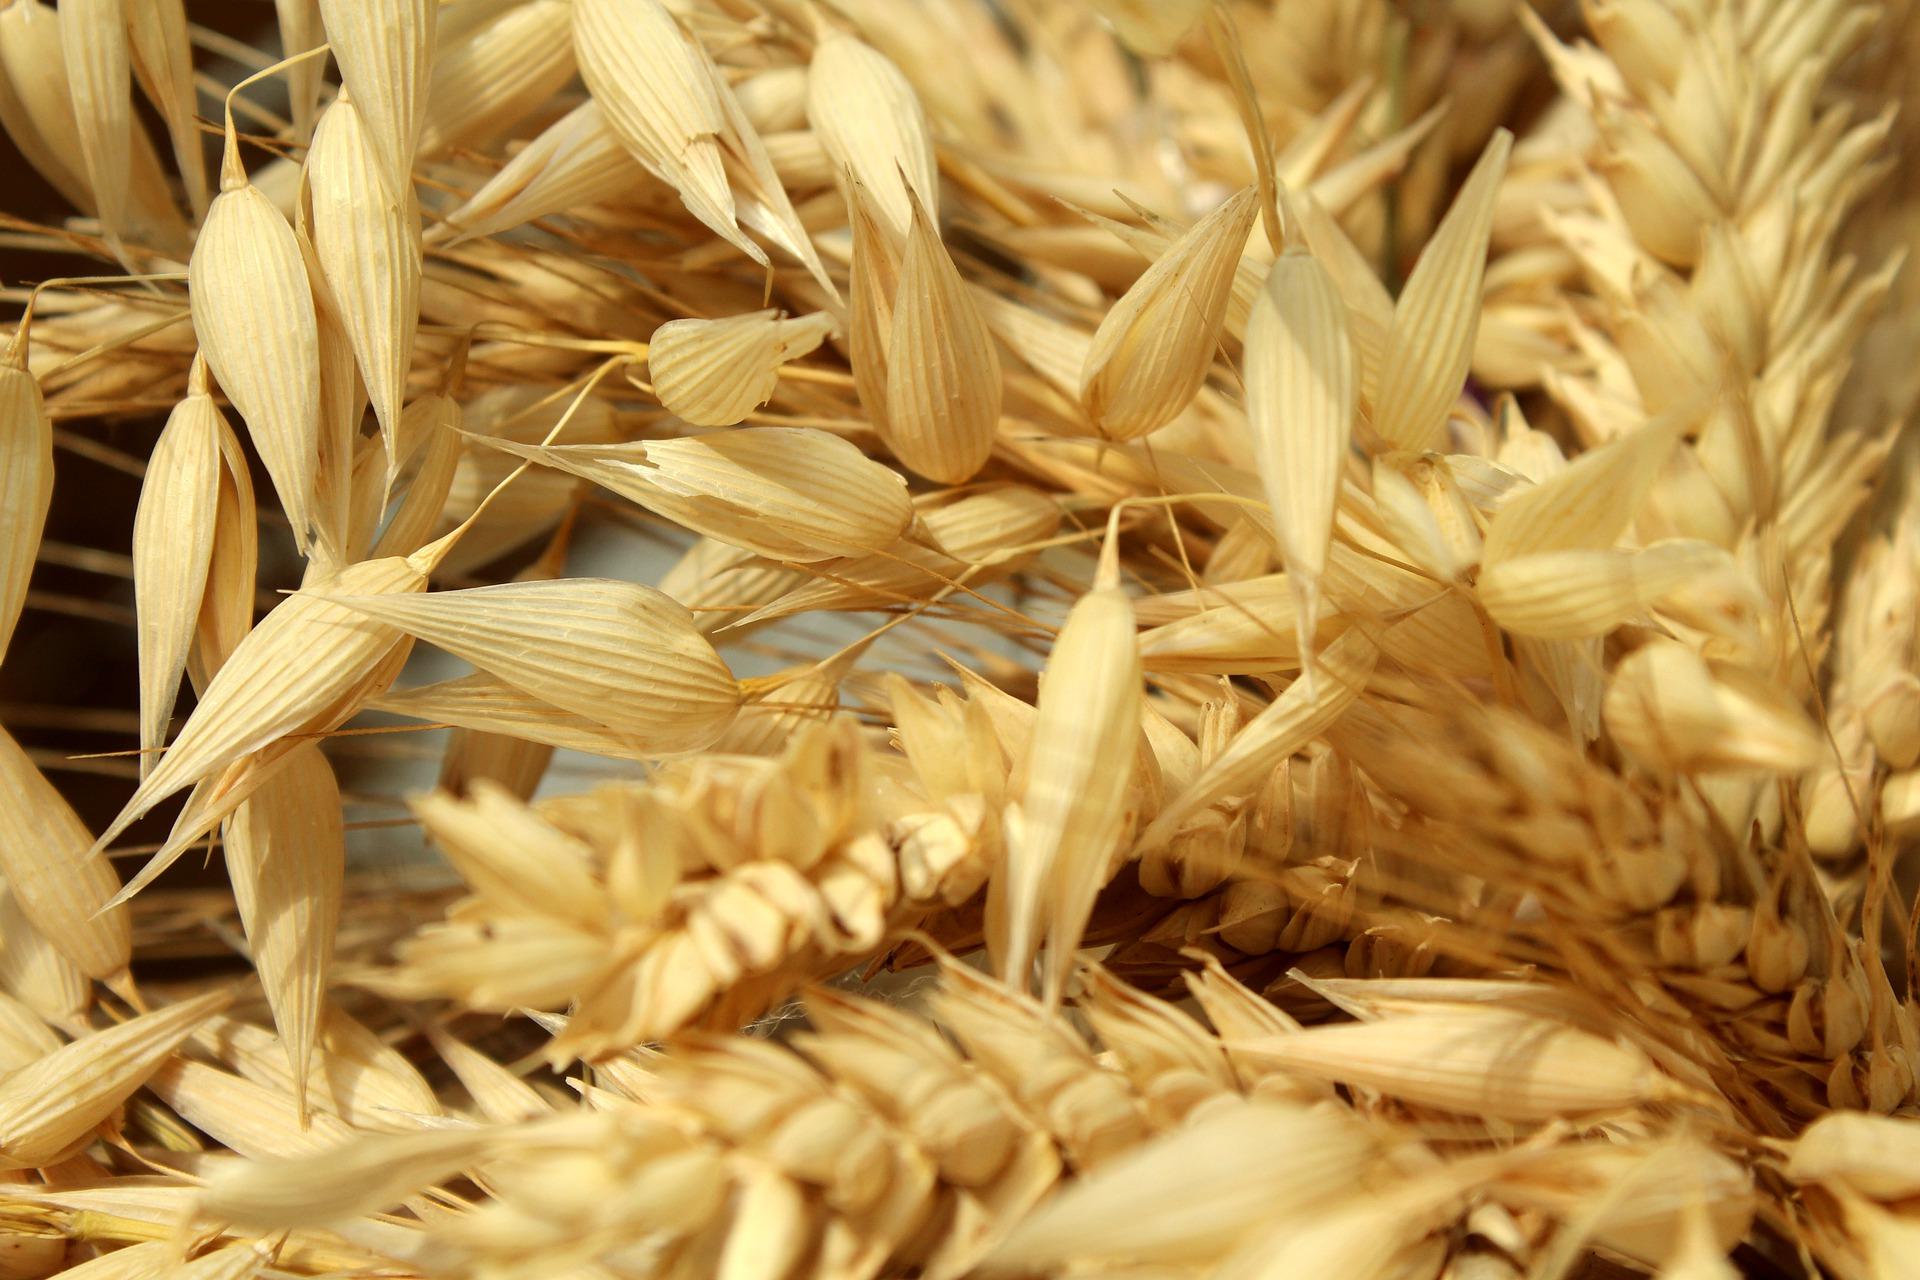 corn-4458568_1920 - Image by _Alicja_ fr